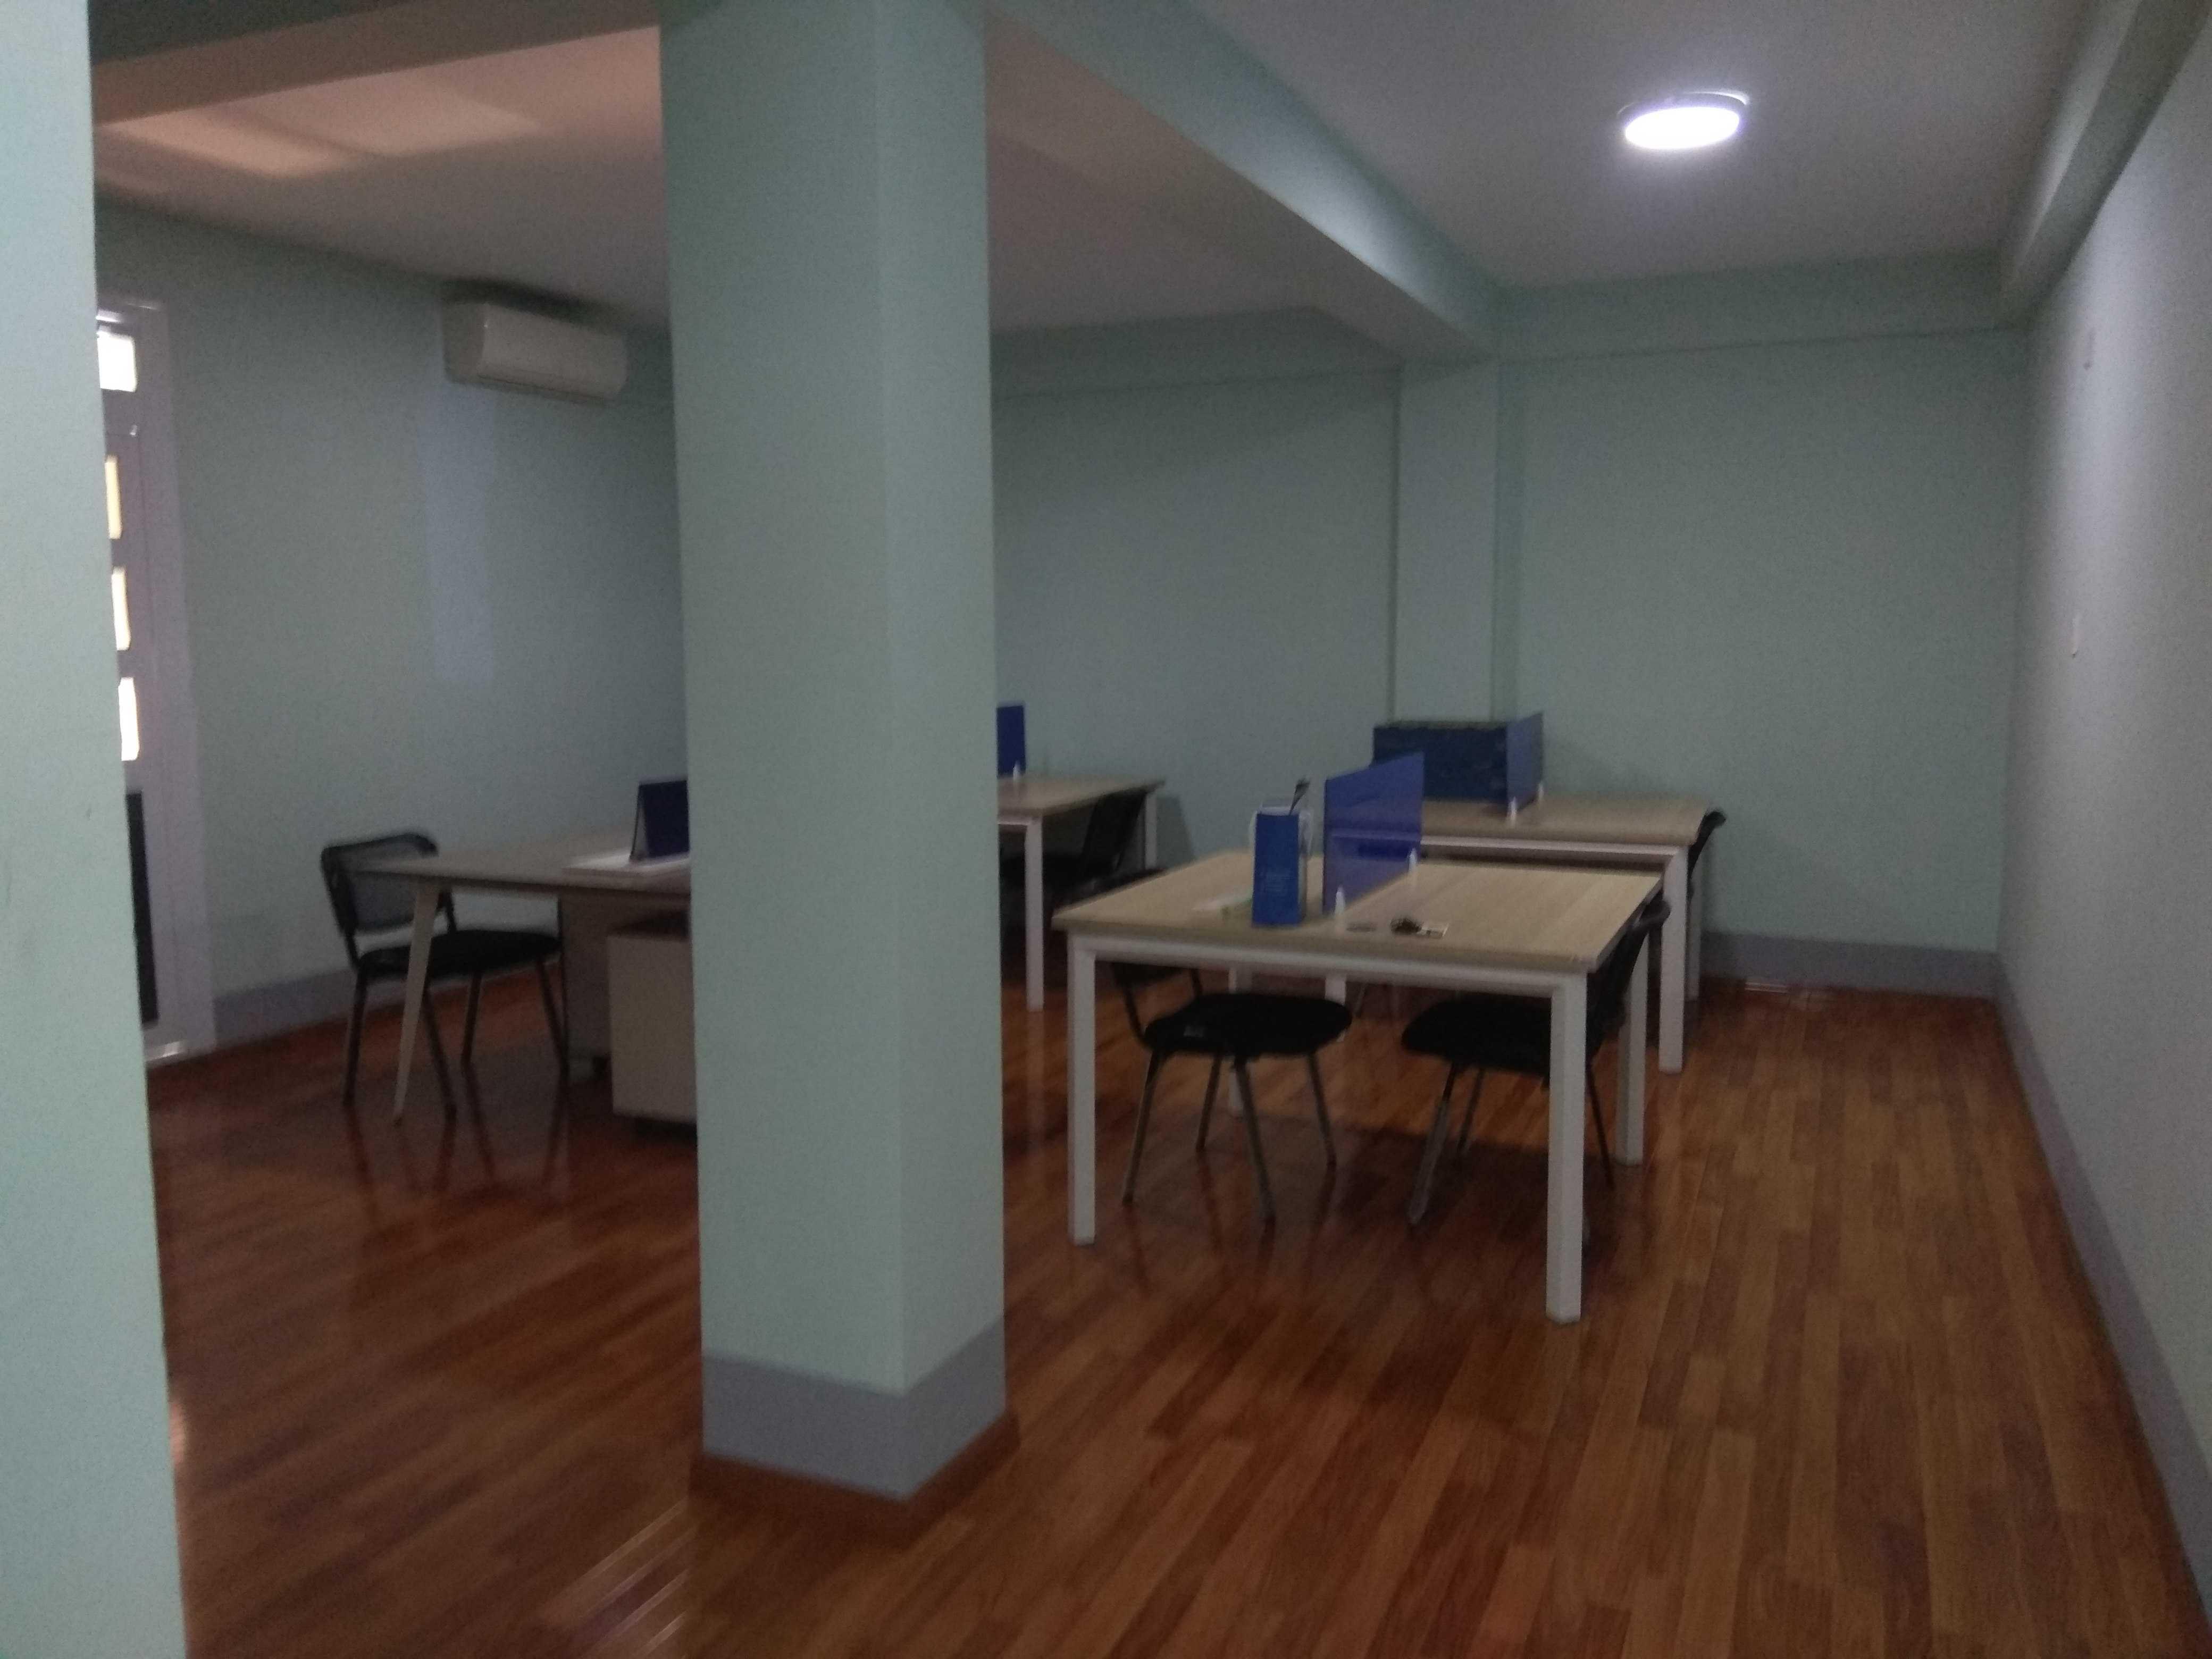 Nodetalent Co-Working Space, Yangon